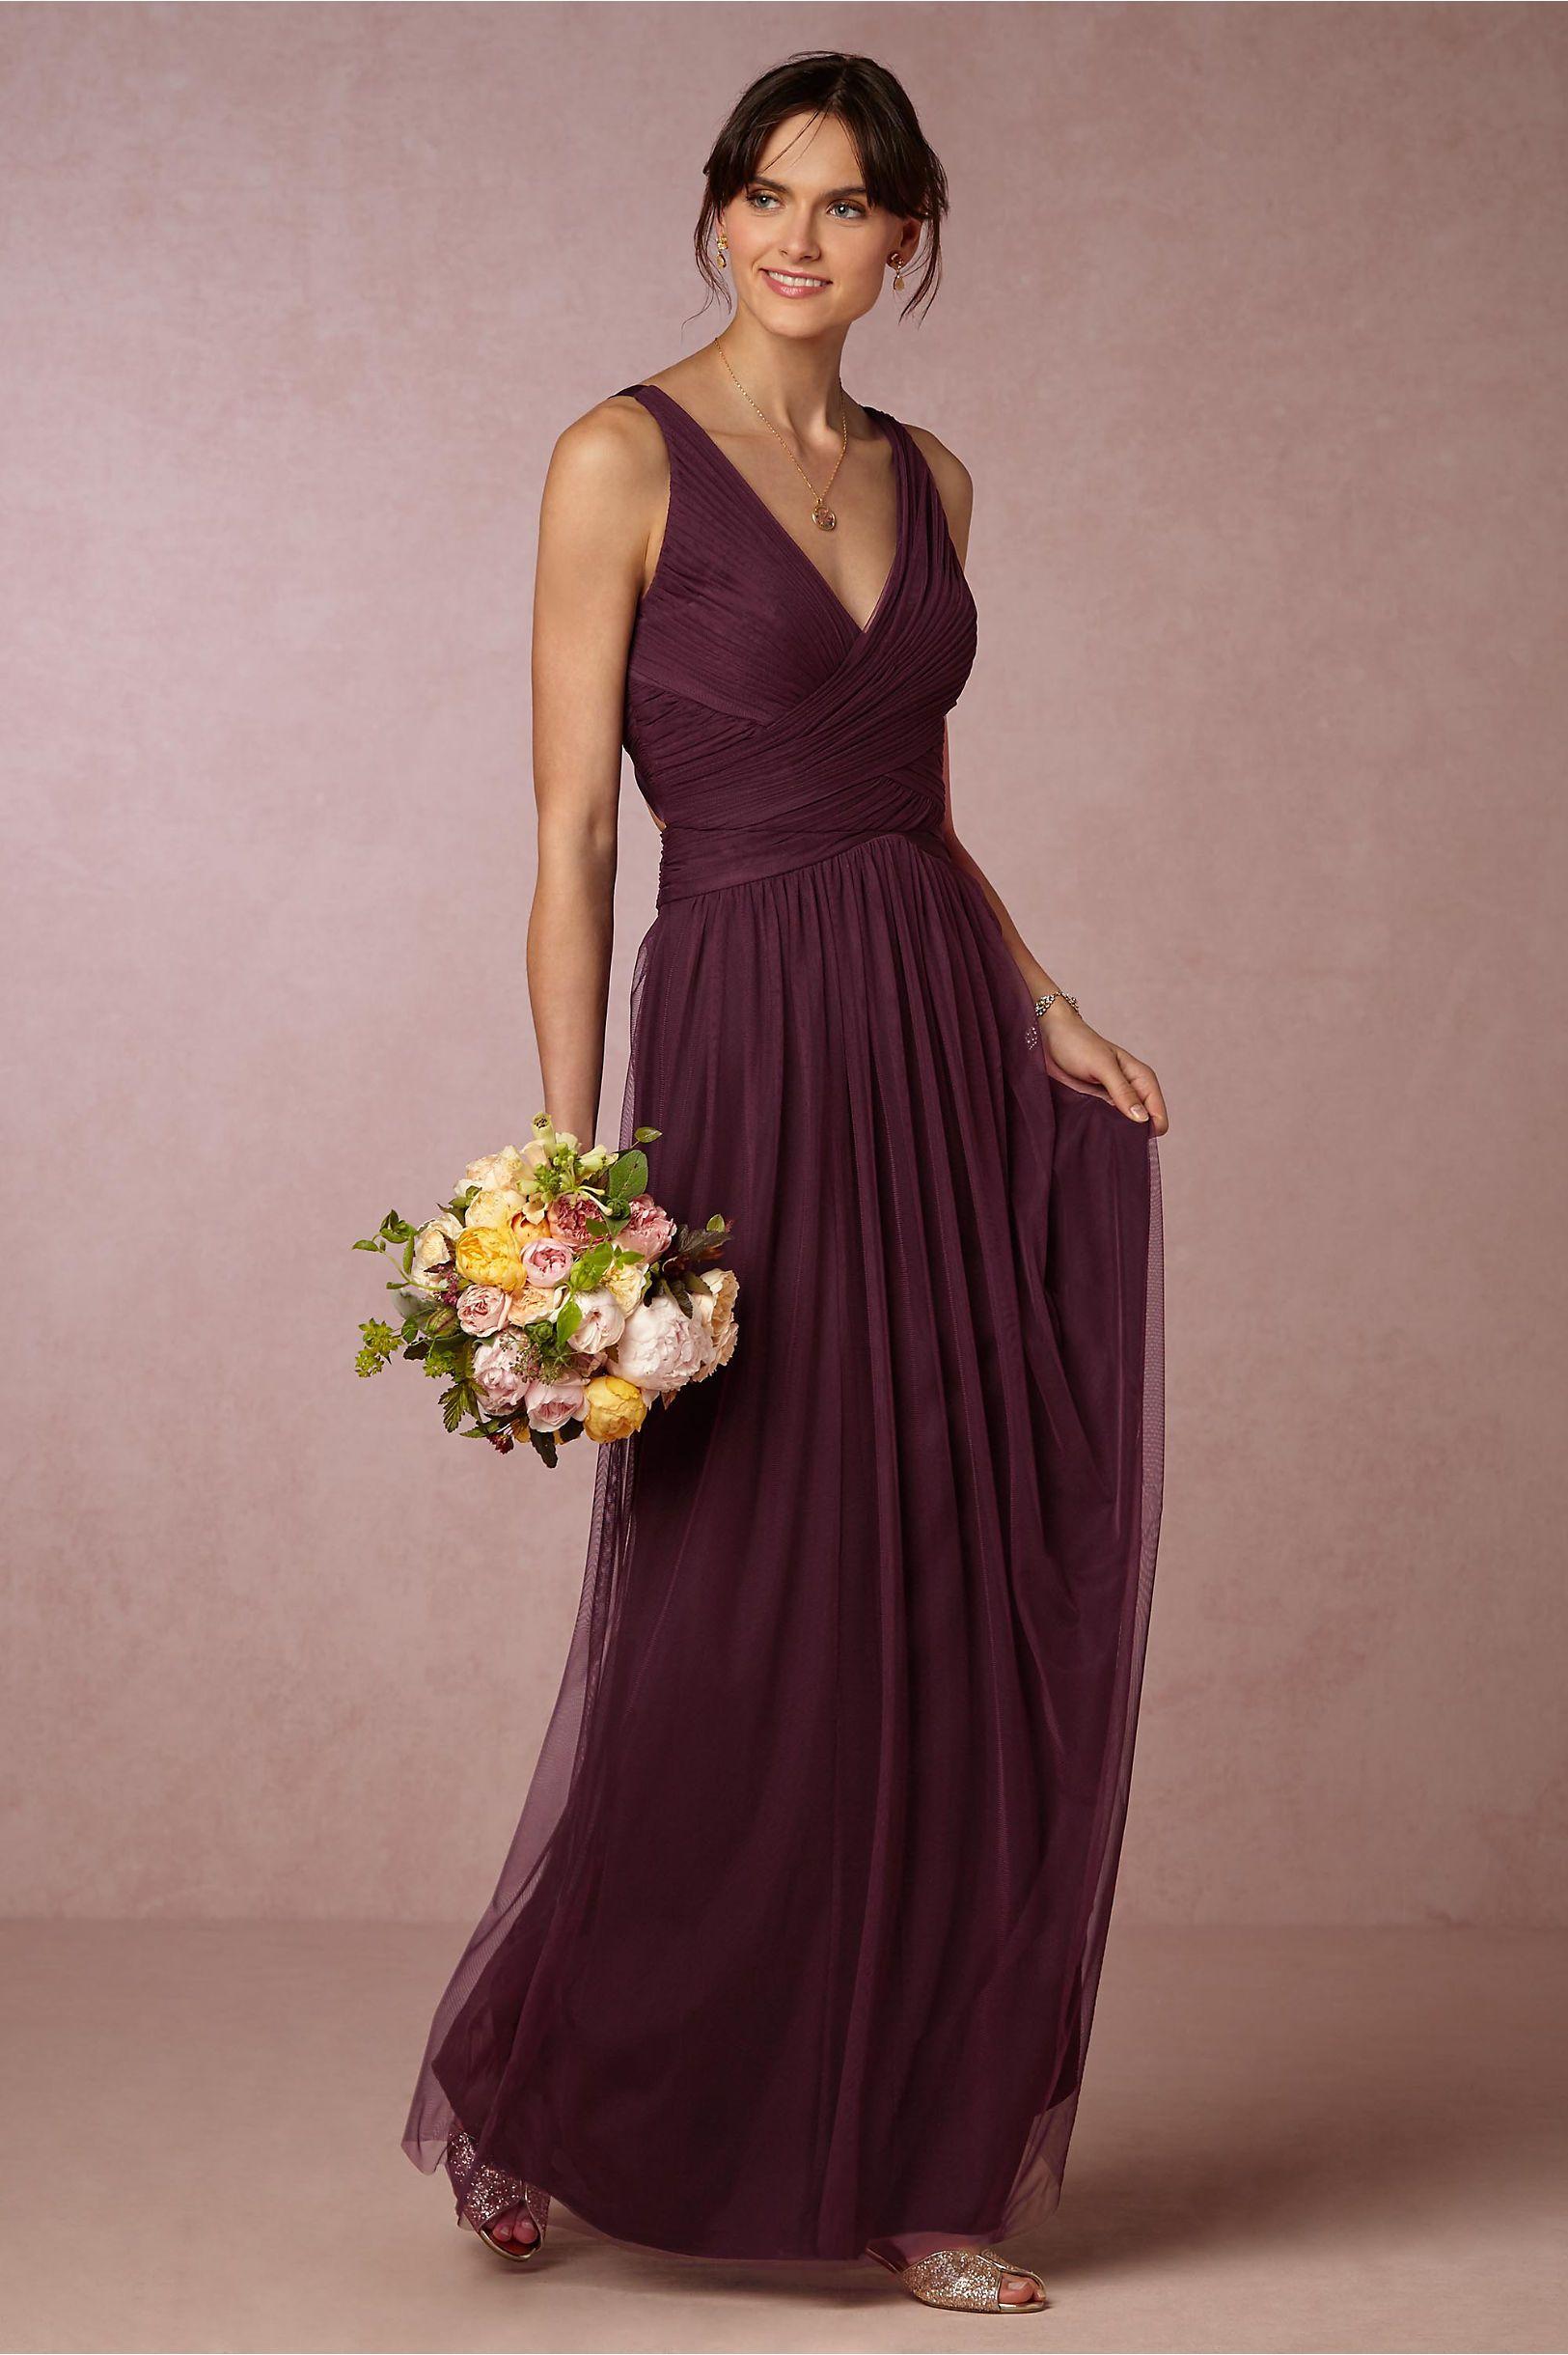 Bhldn edith dress in bridesmaids bridesmaid dresses at bhldn bhldn edith dress in bridesmaids bridesmaid dresses at bhldn ombrellifo Images